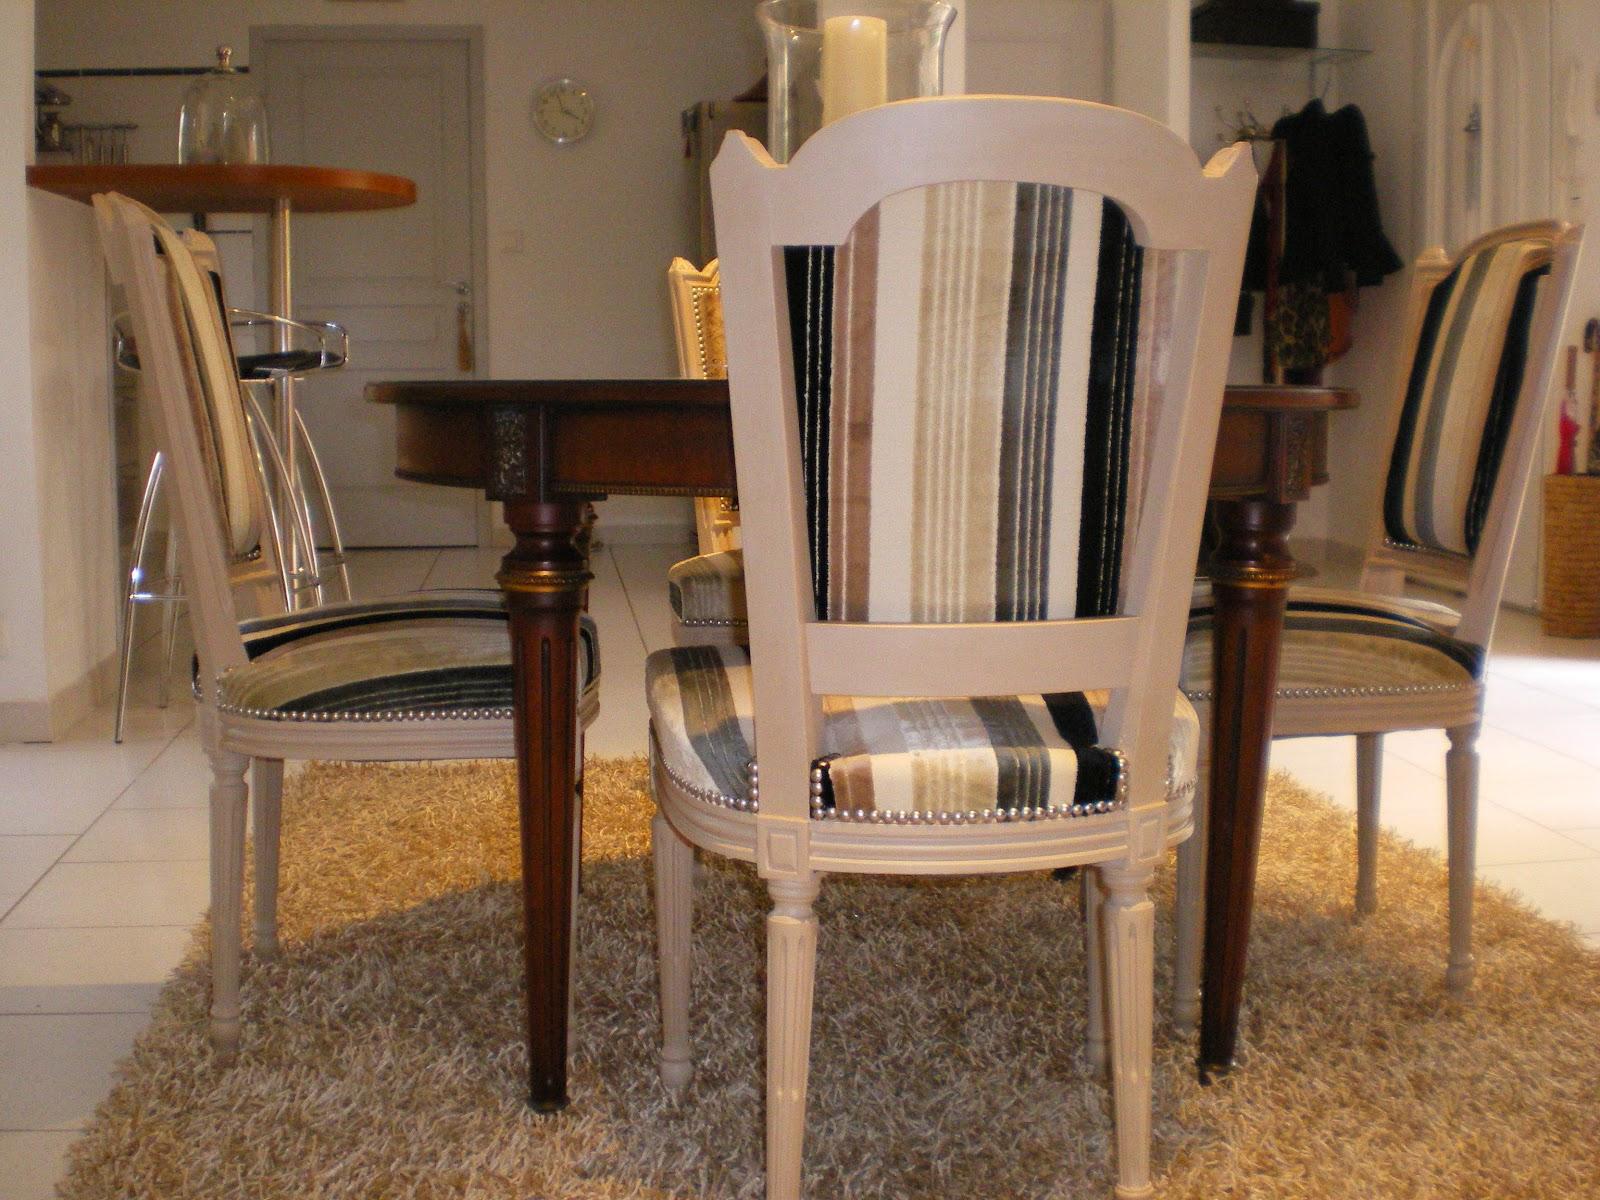 article plus r cent. Black Bedroom Furniture Sets. Home Design Ideas